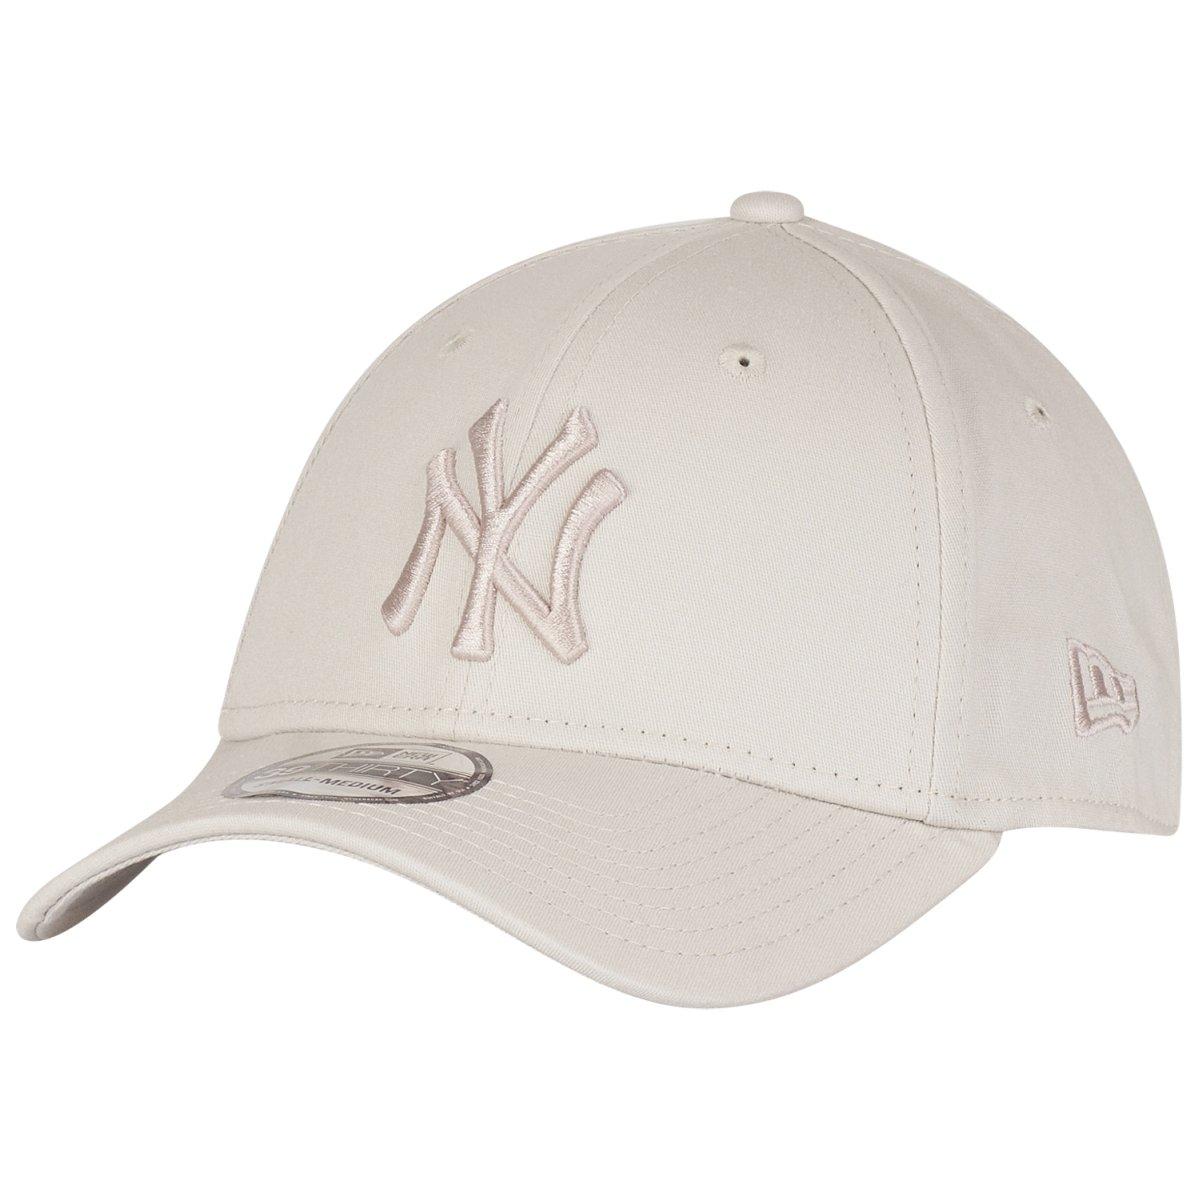 Details about New Era 39Thirty Flexfit Cap - New York Yankees stone beige 9ff1ba387b5